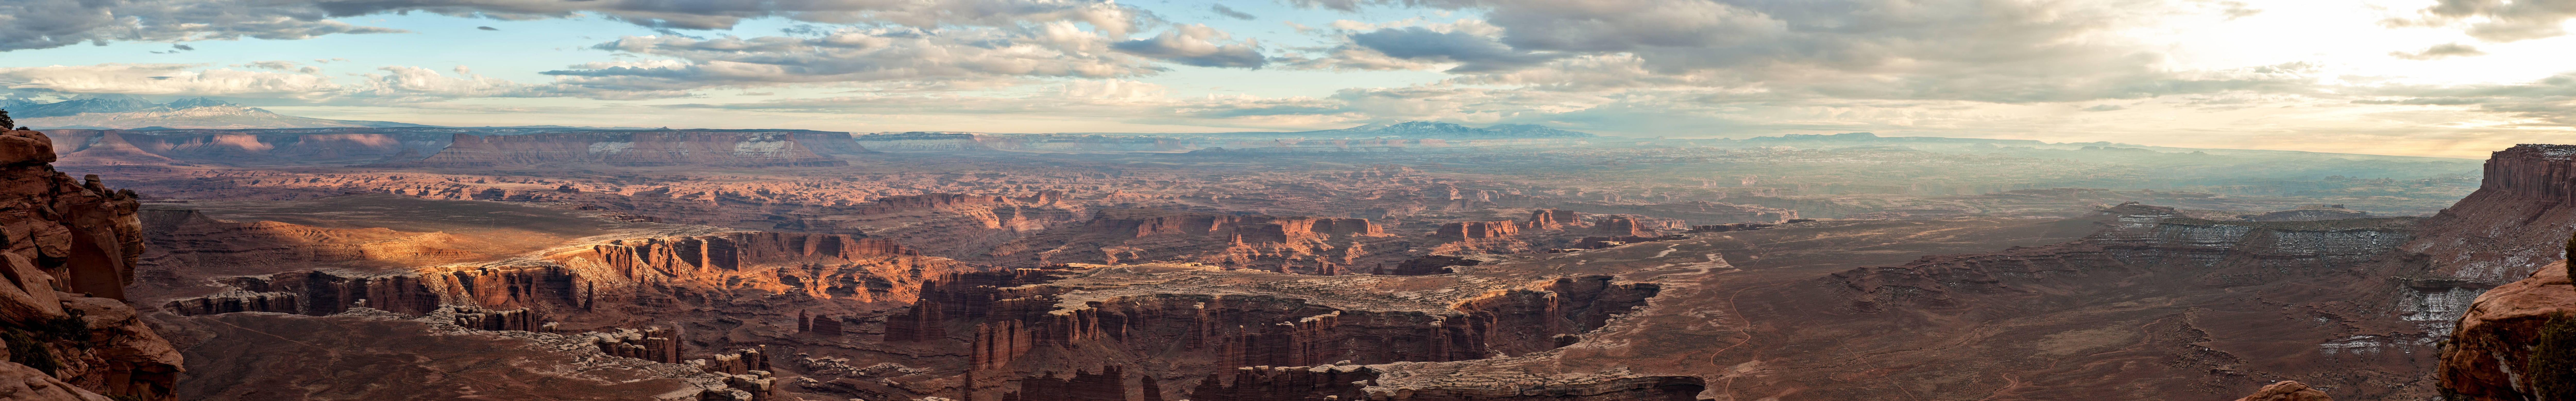 4k panoramic wallpaper - photo #18